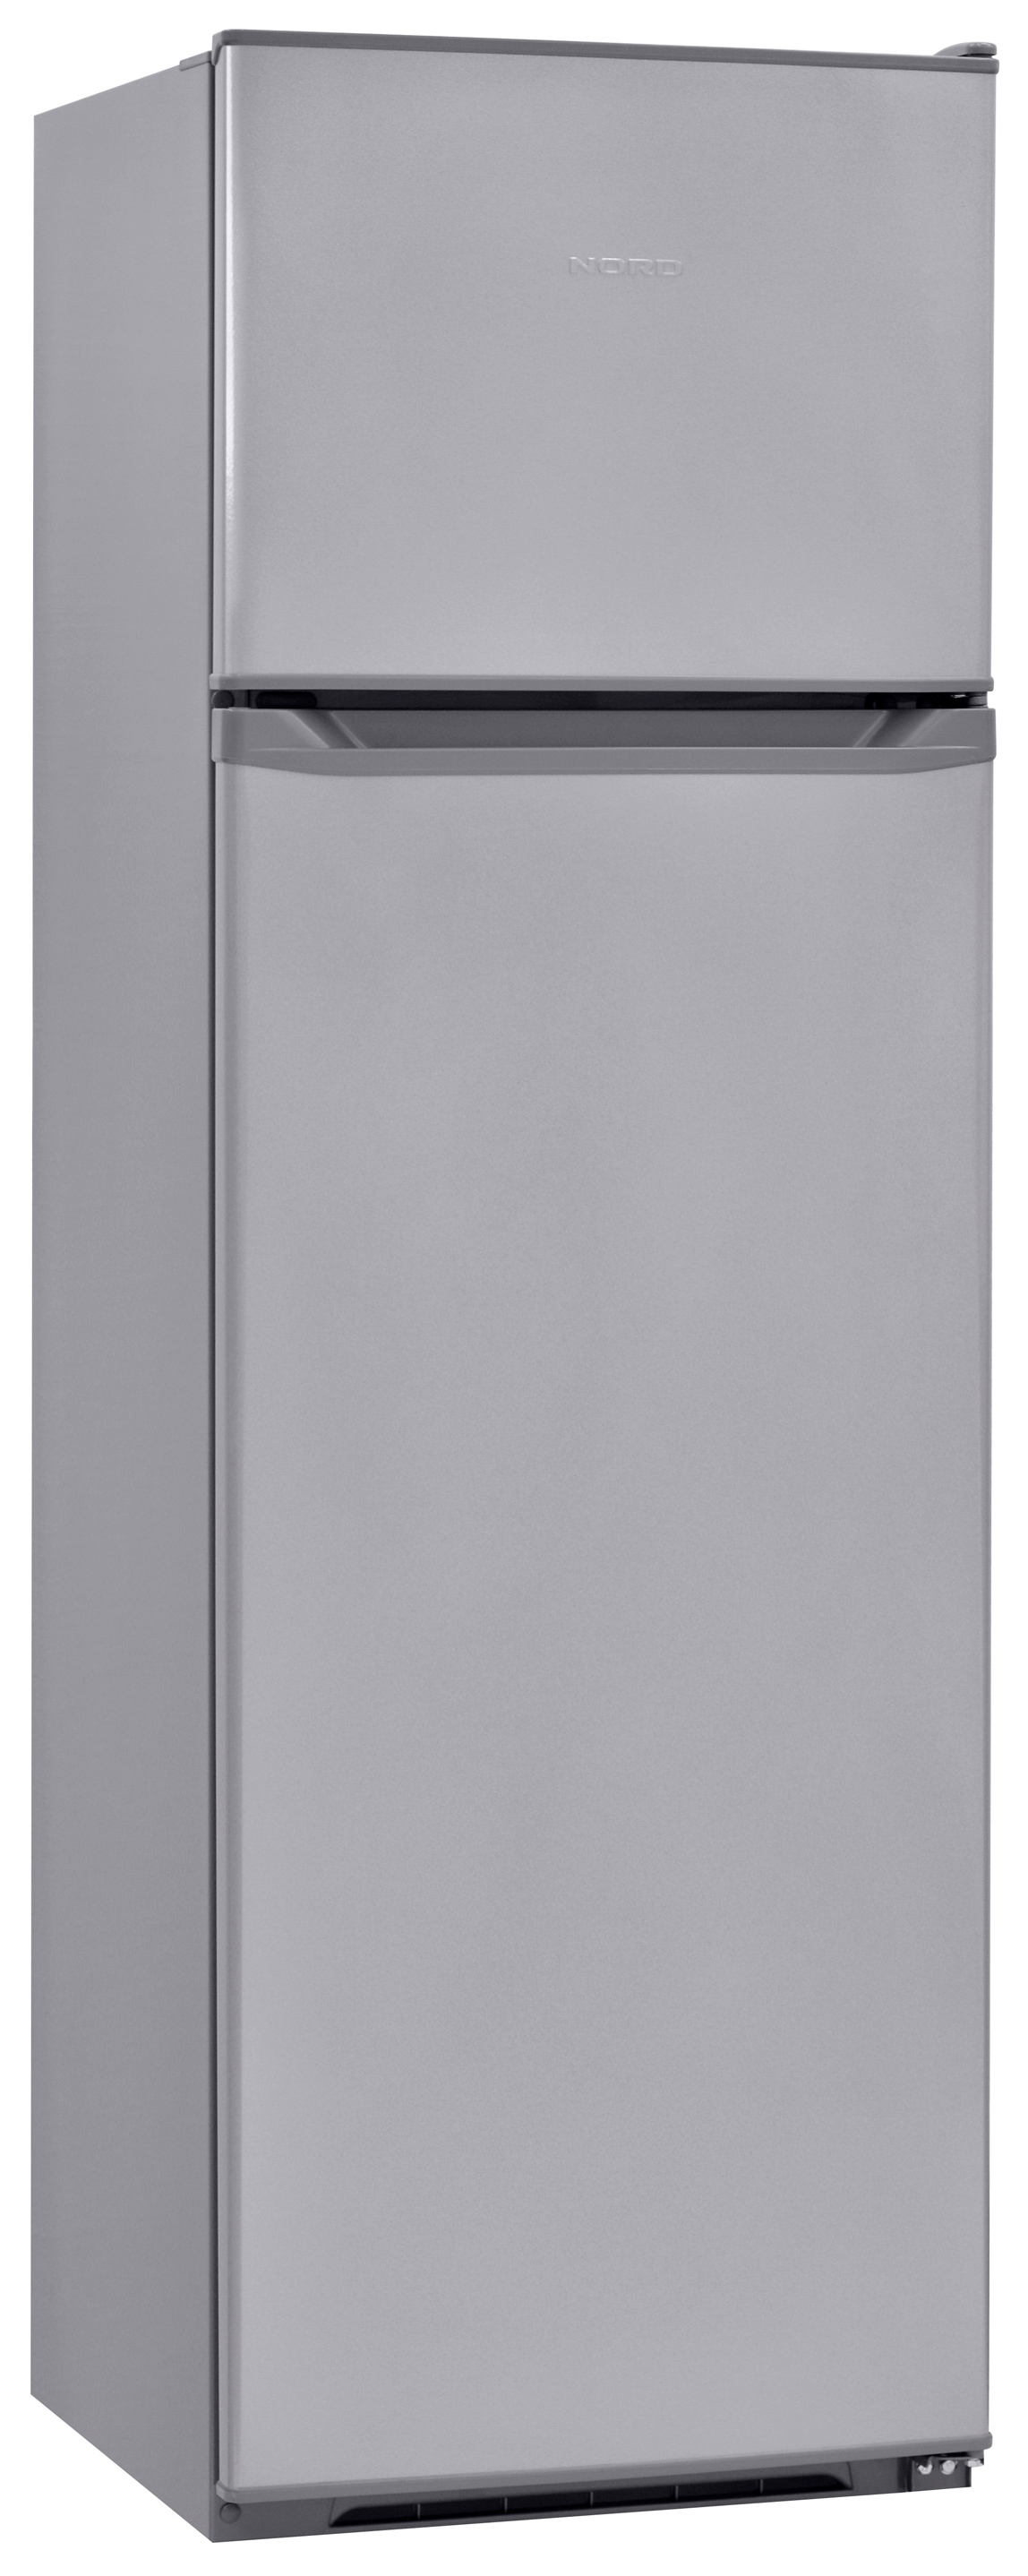 Холодильник NORD NRT 144 332 A Silver